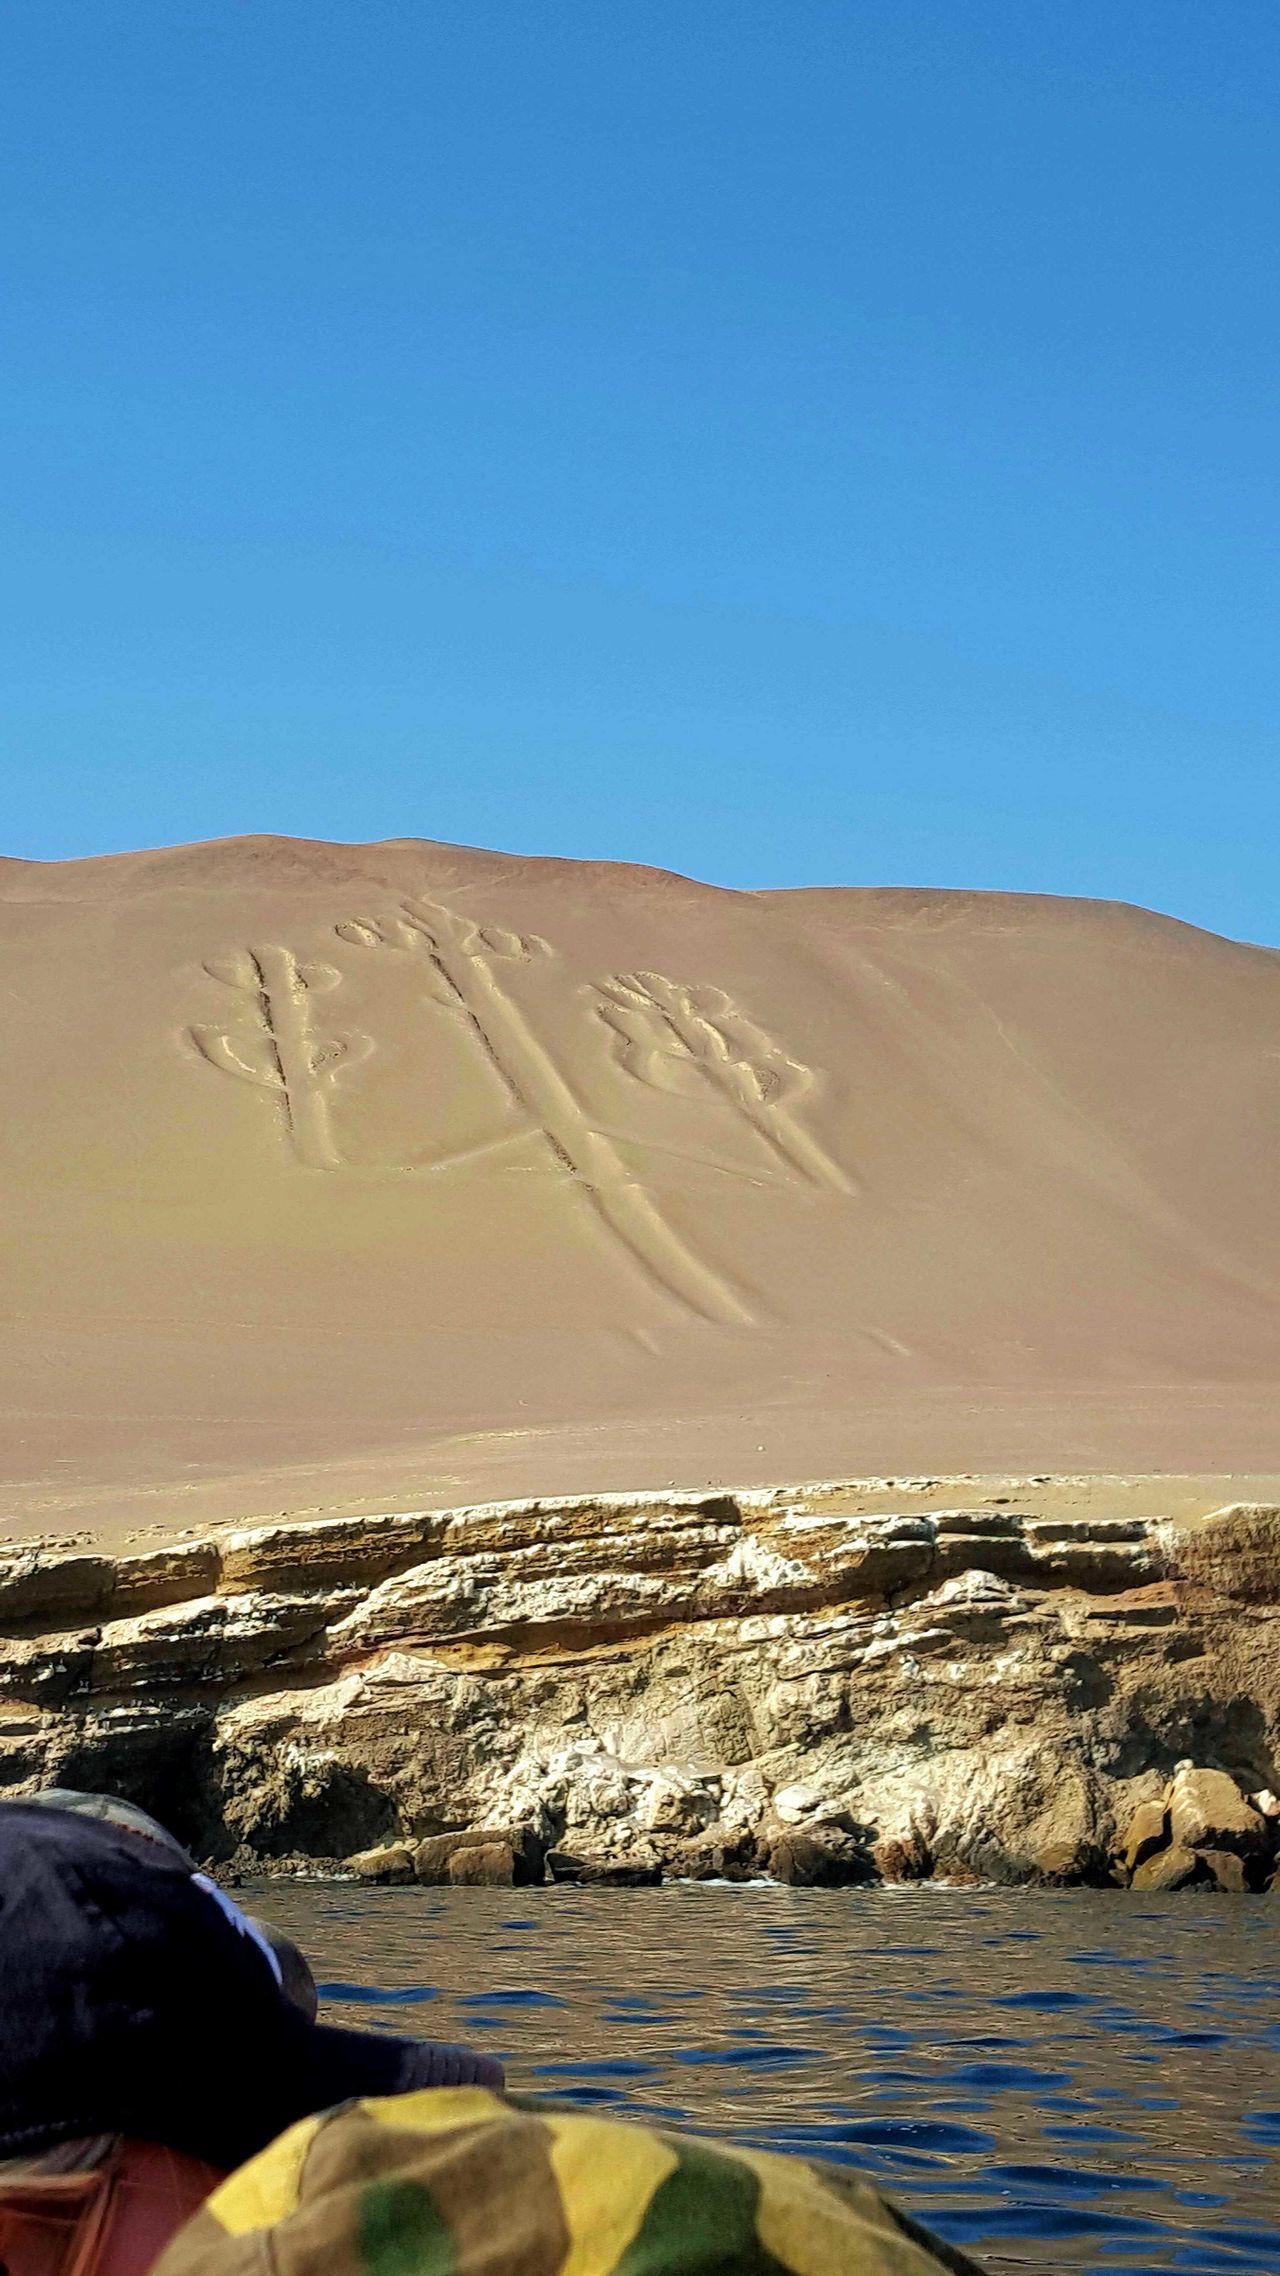 Candelabro Sand Dune Clear Sky The Chandelier Paracas-Ica Culture